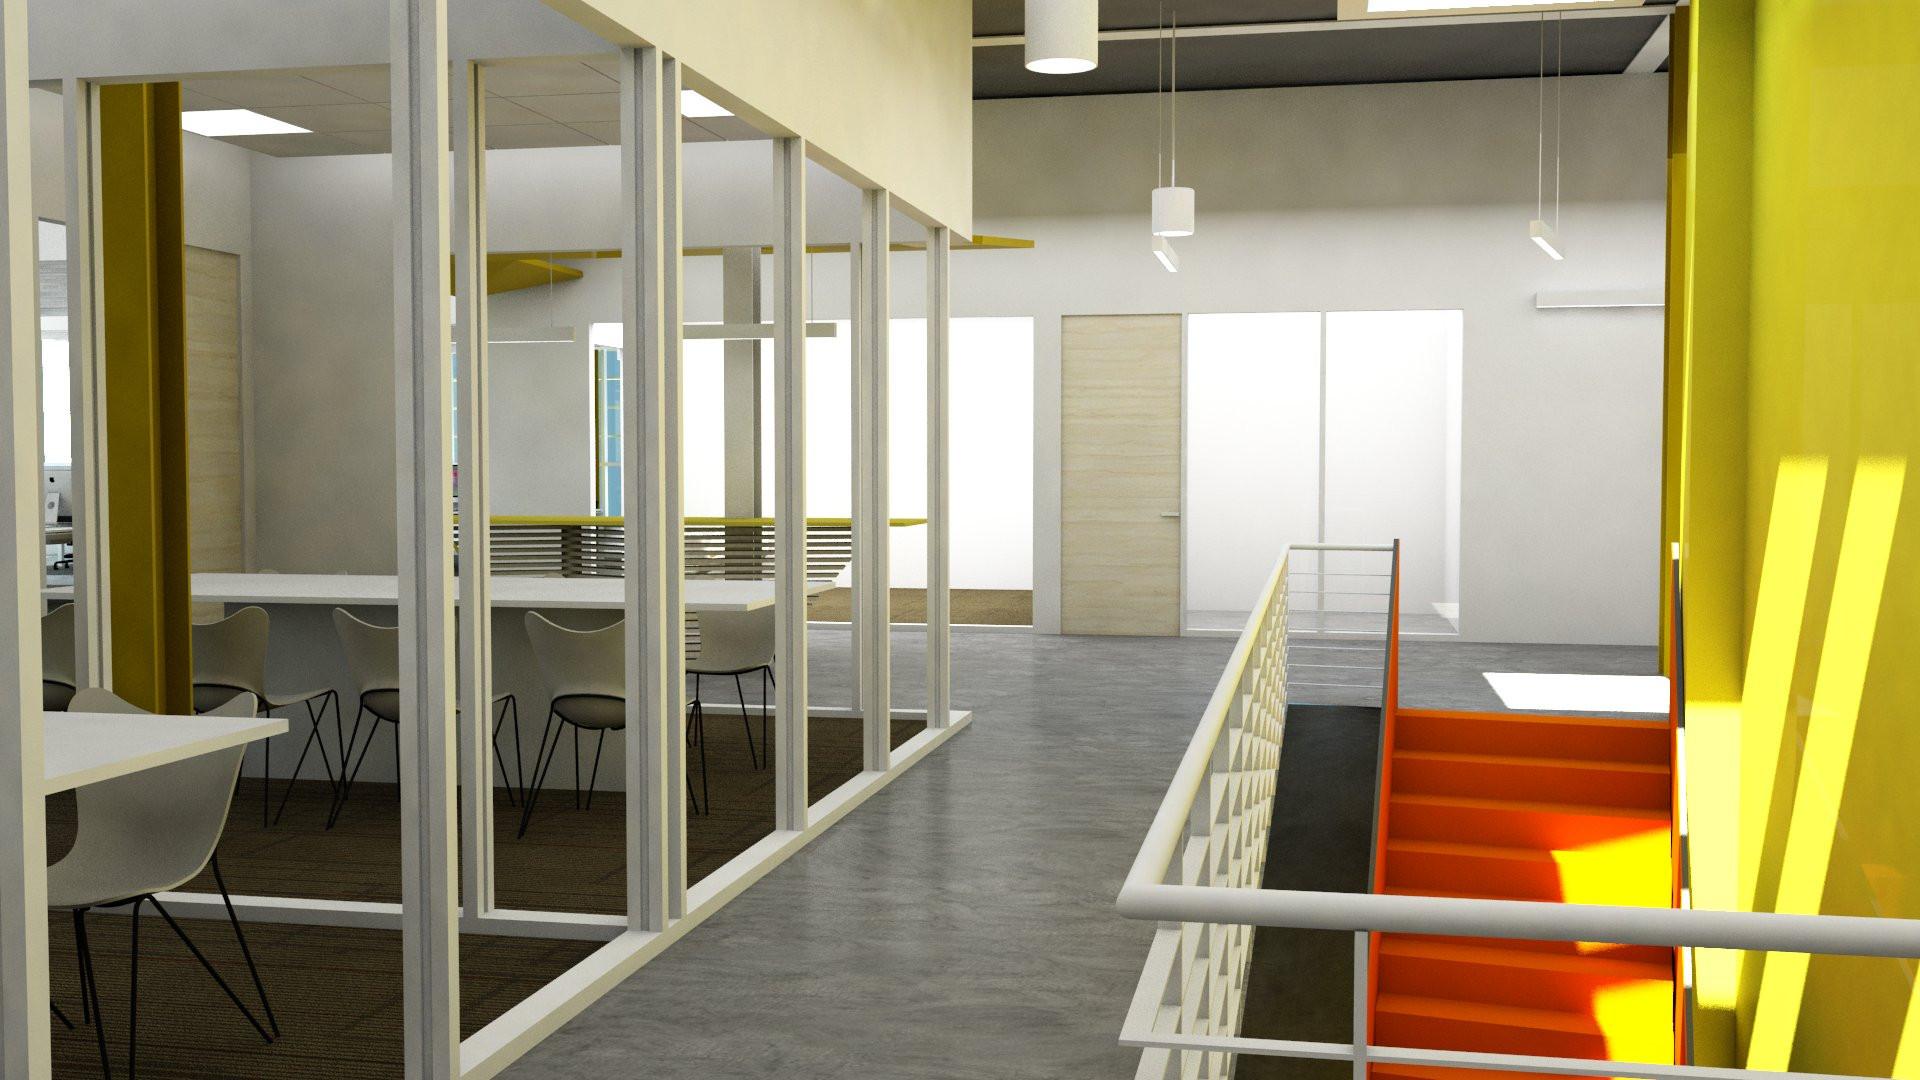 Gut Renovation of an Office Interior